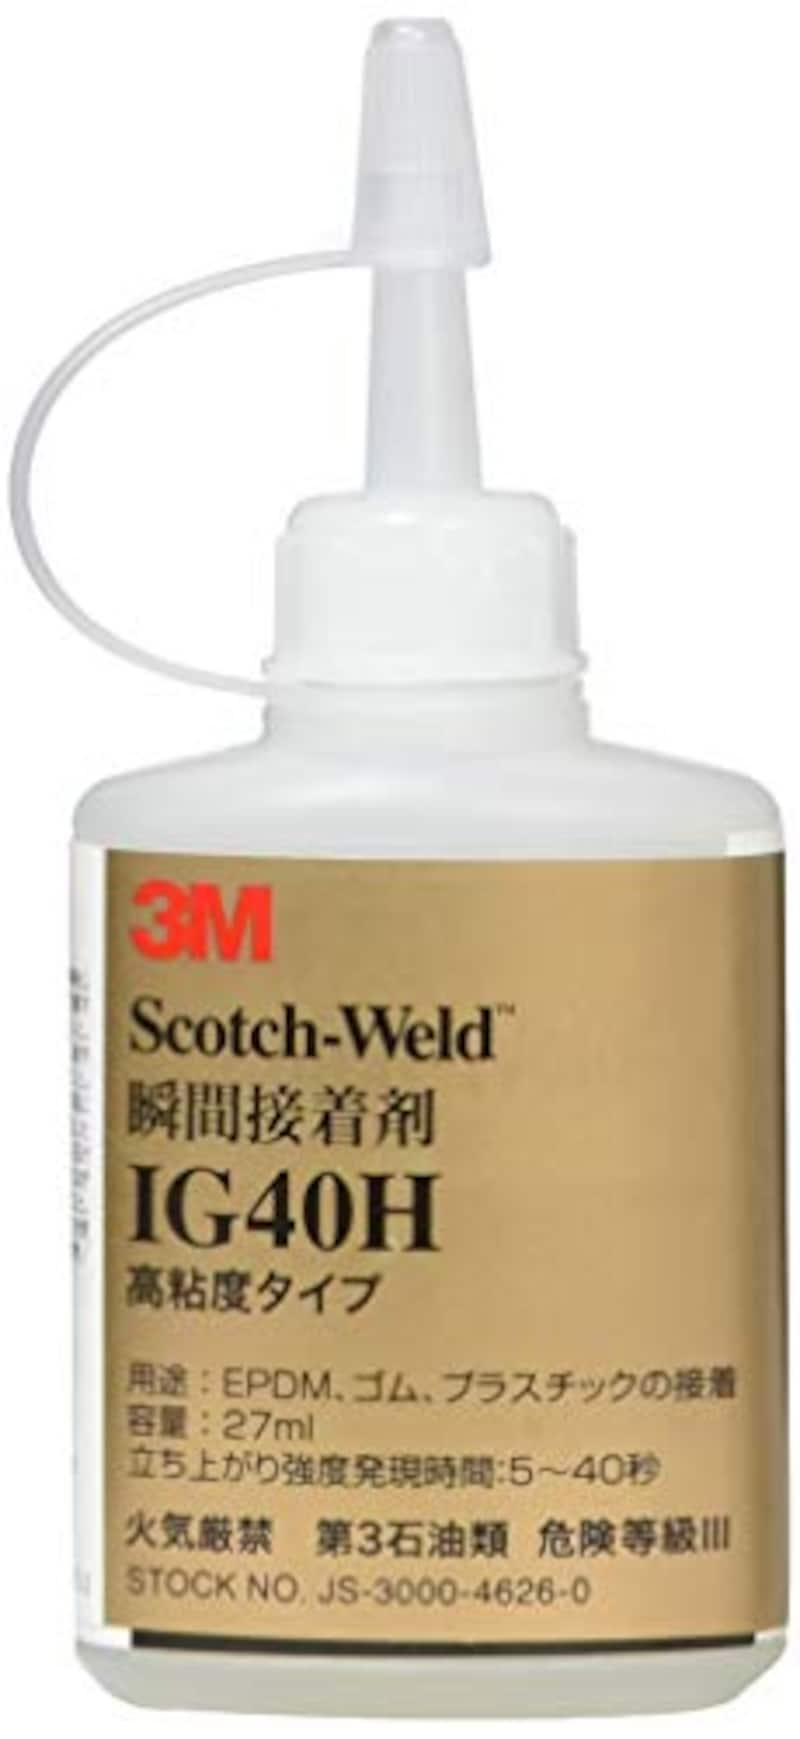 3M(スリーエム),Scotch-Weld 瞬間接着剤,IG40H